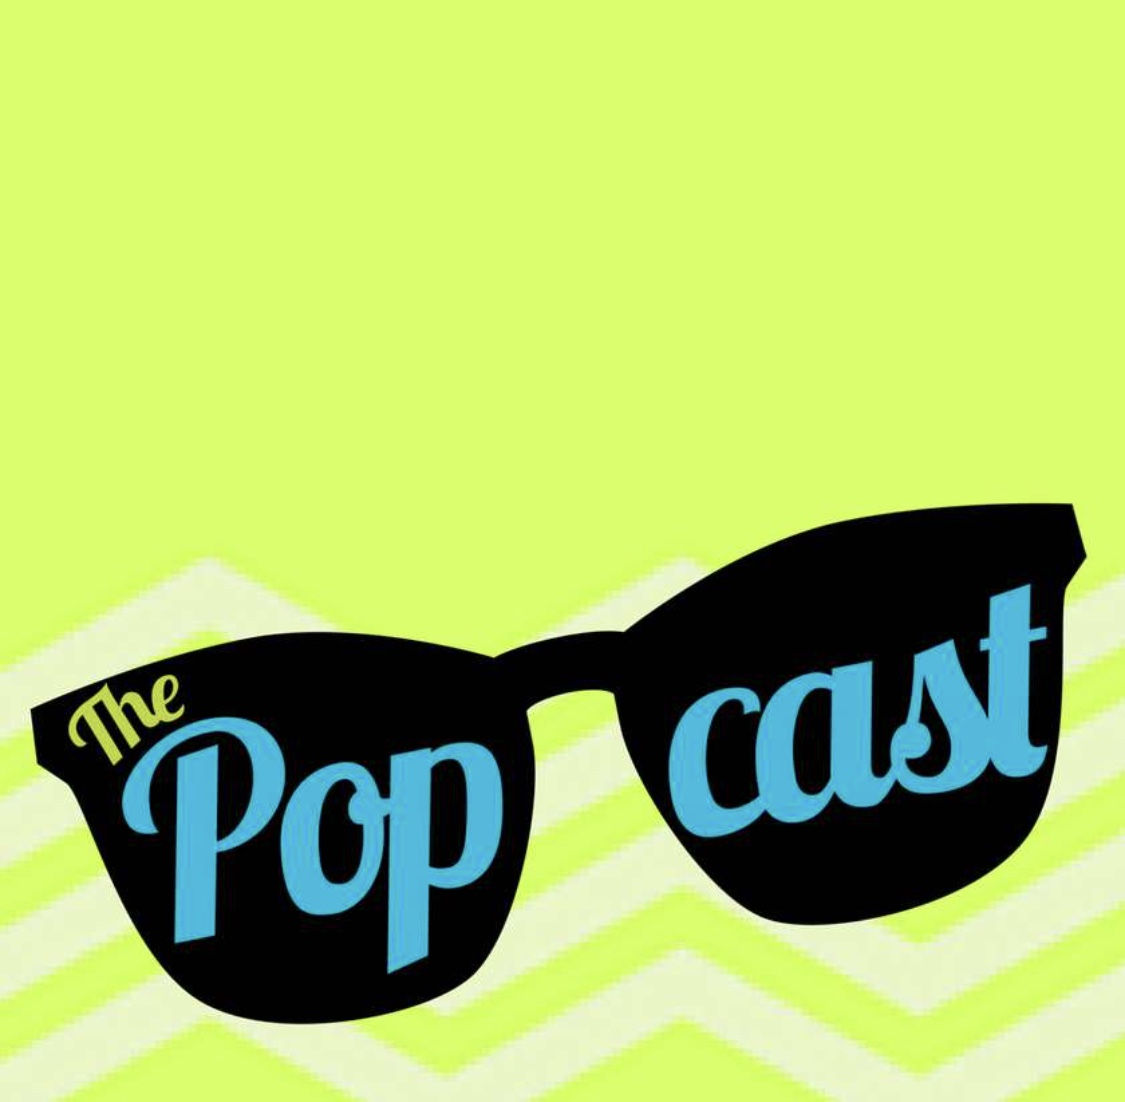 pop cast.jpg